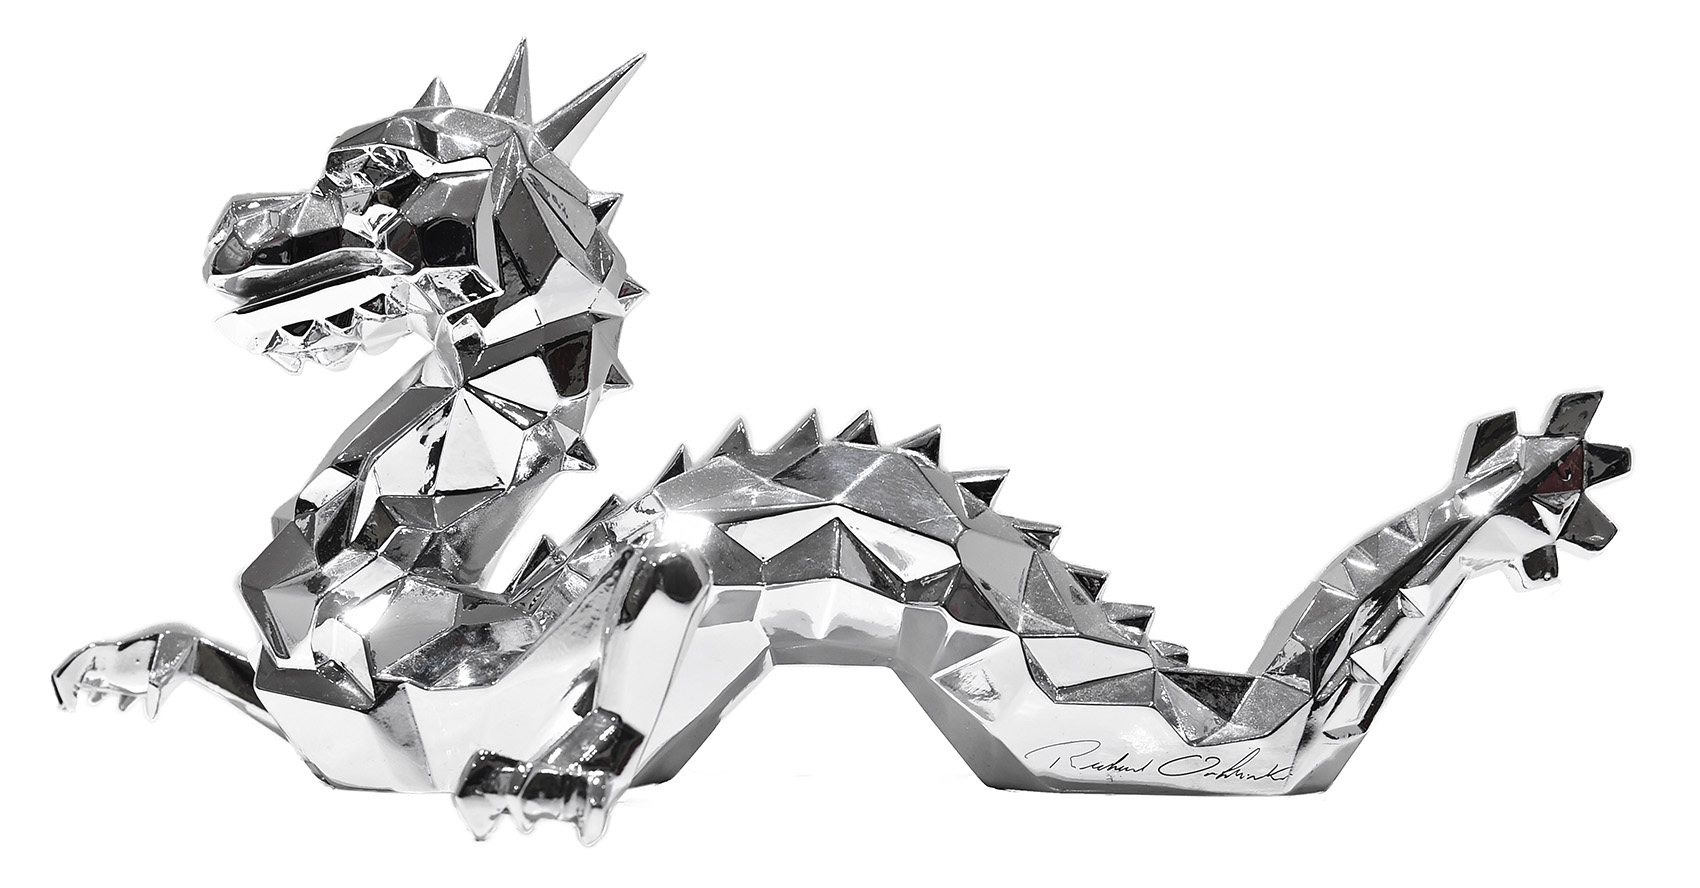 Dragon by Richard Orlinski